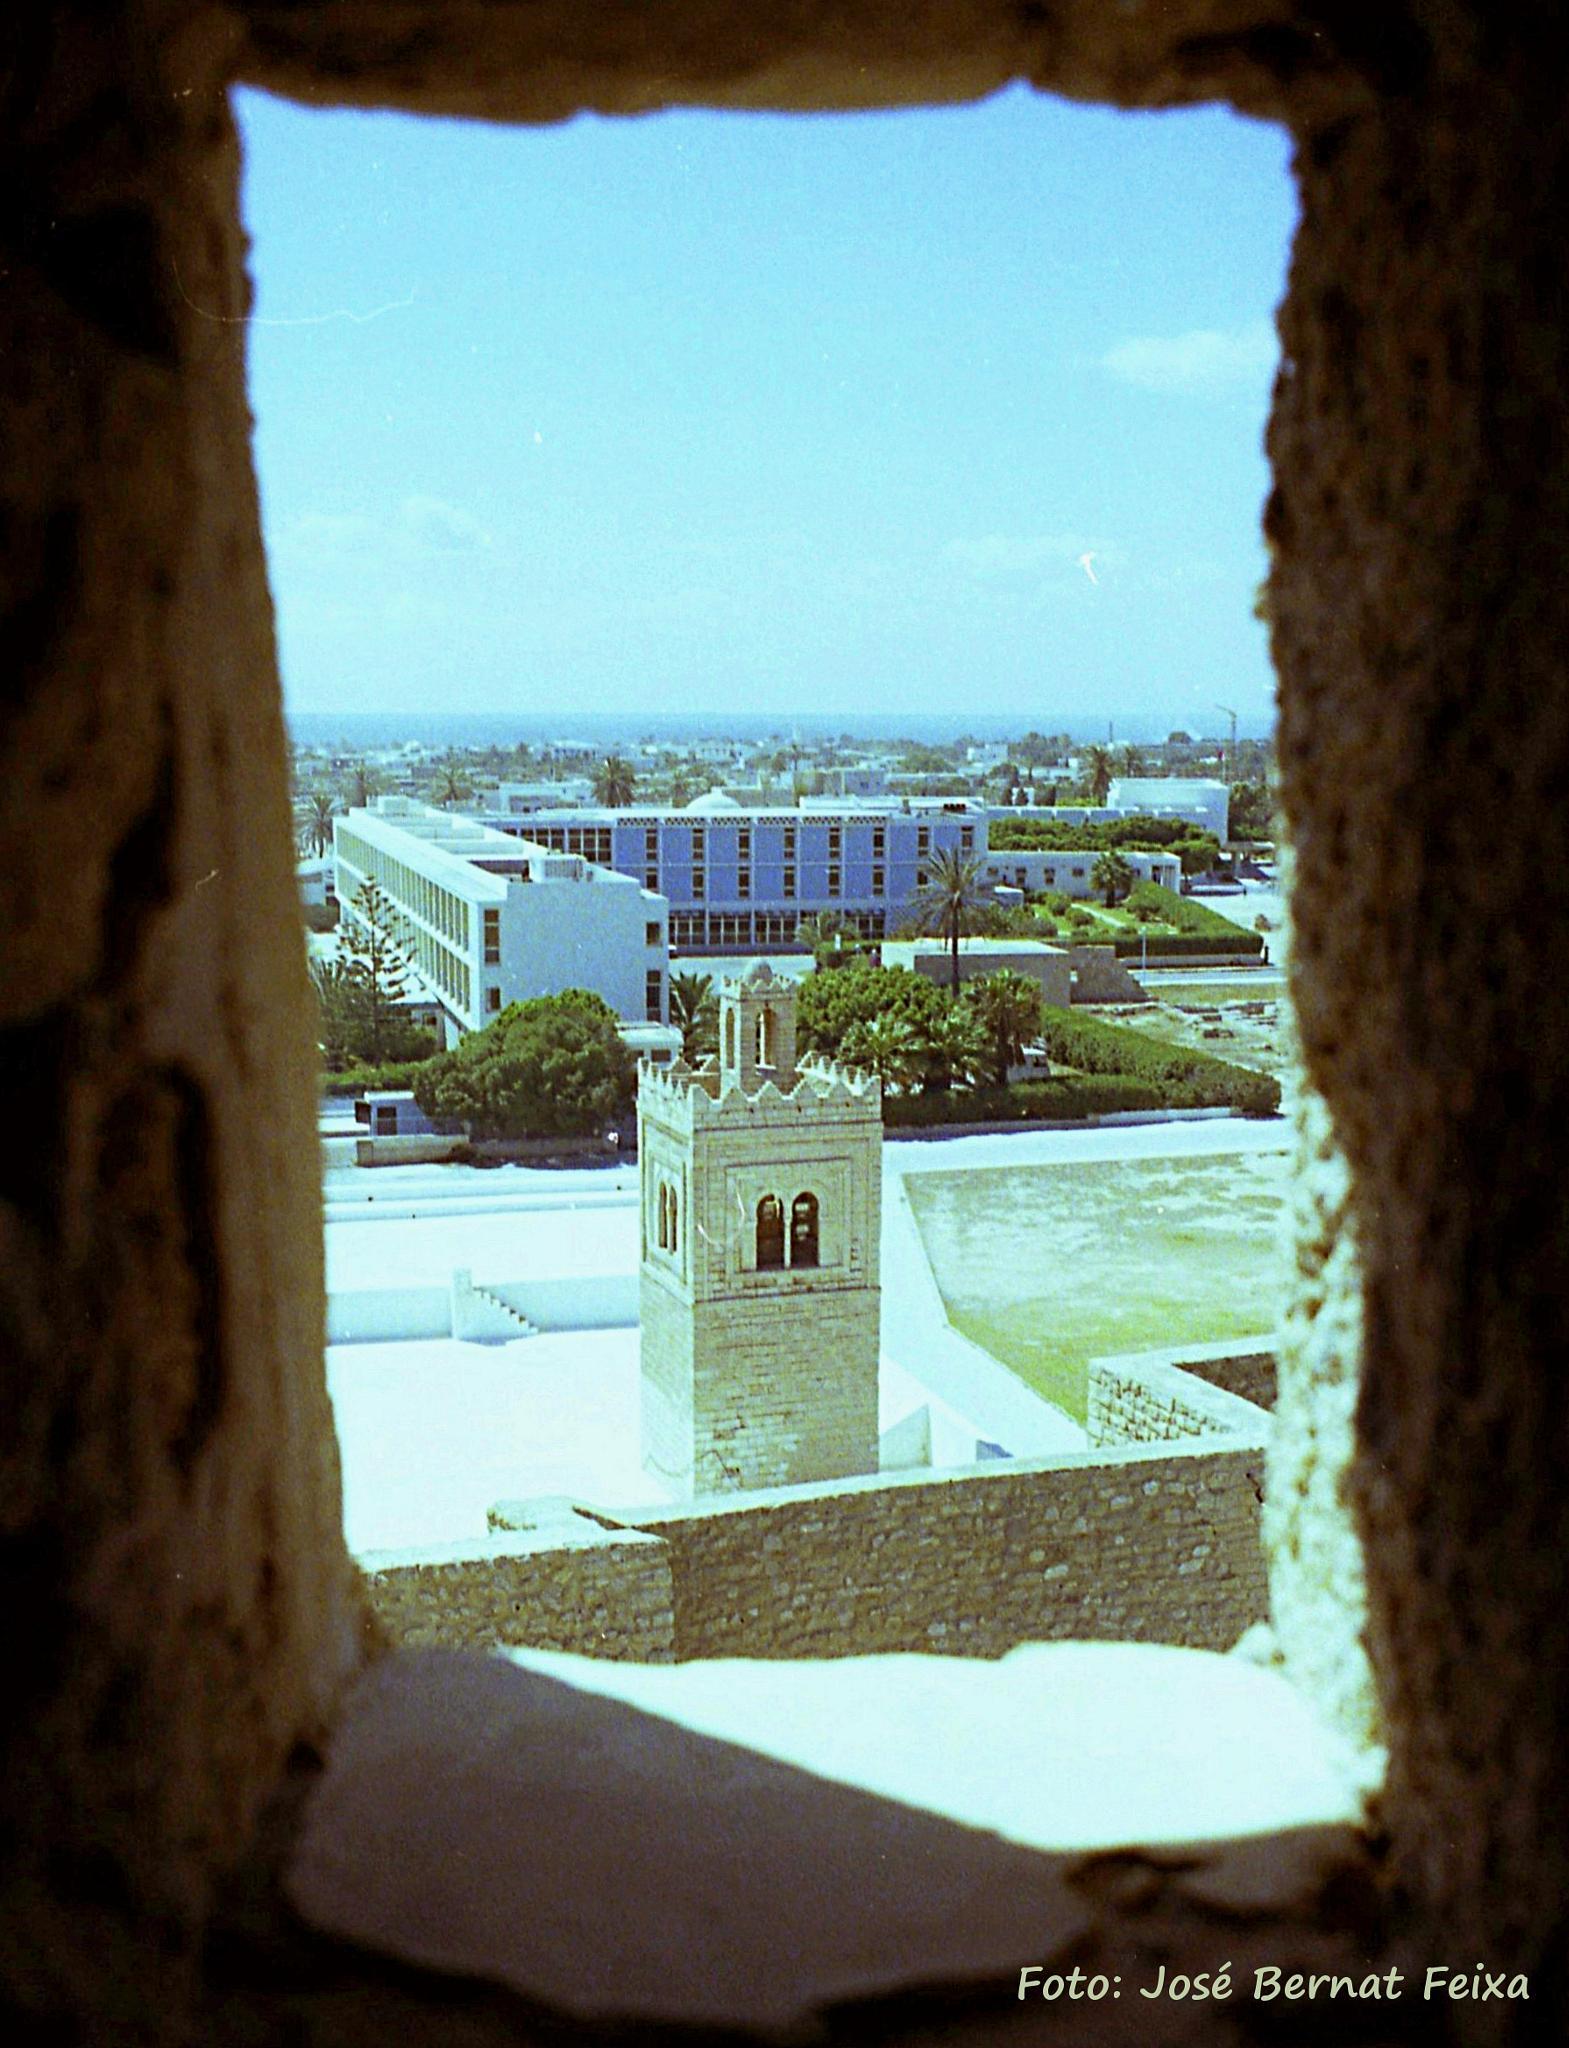 VISTA, DOORKIJKJE, CITYSCAPE, Monastir,  Sousse, Tunesië (1978)  by José Bernat Feixa